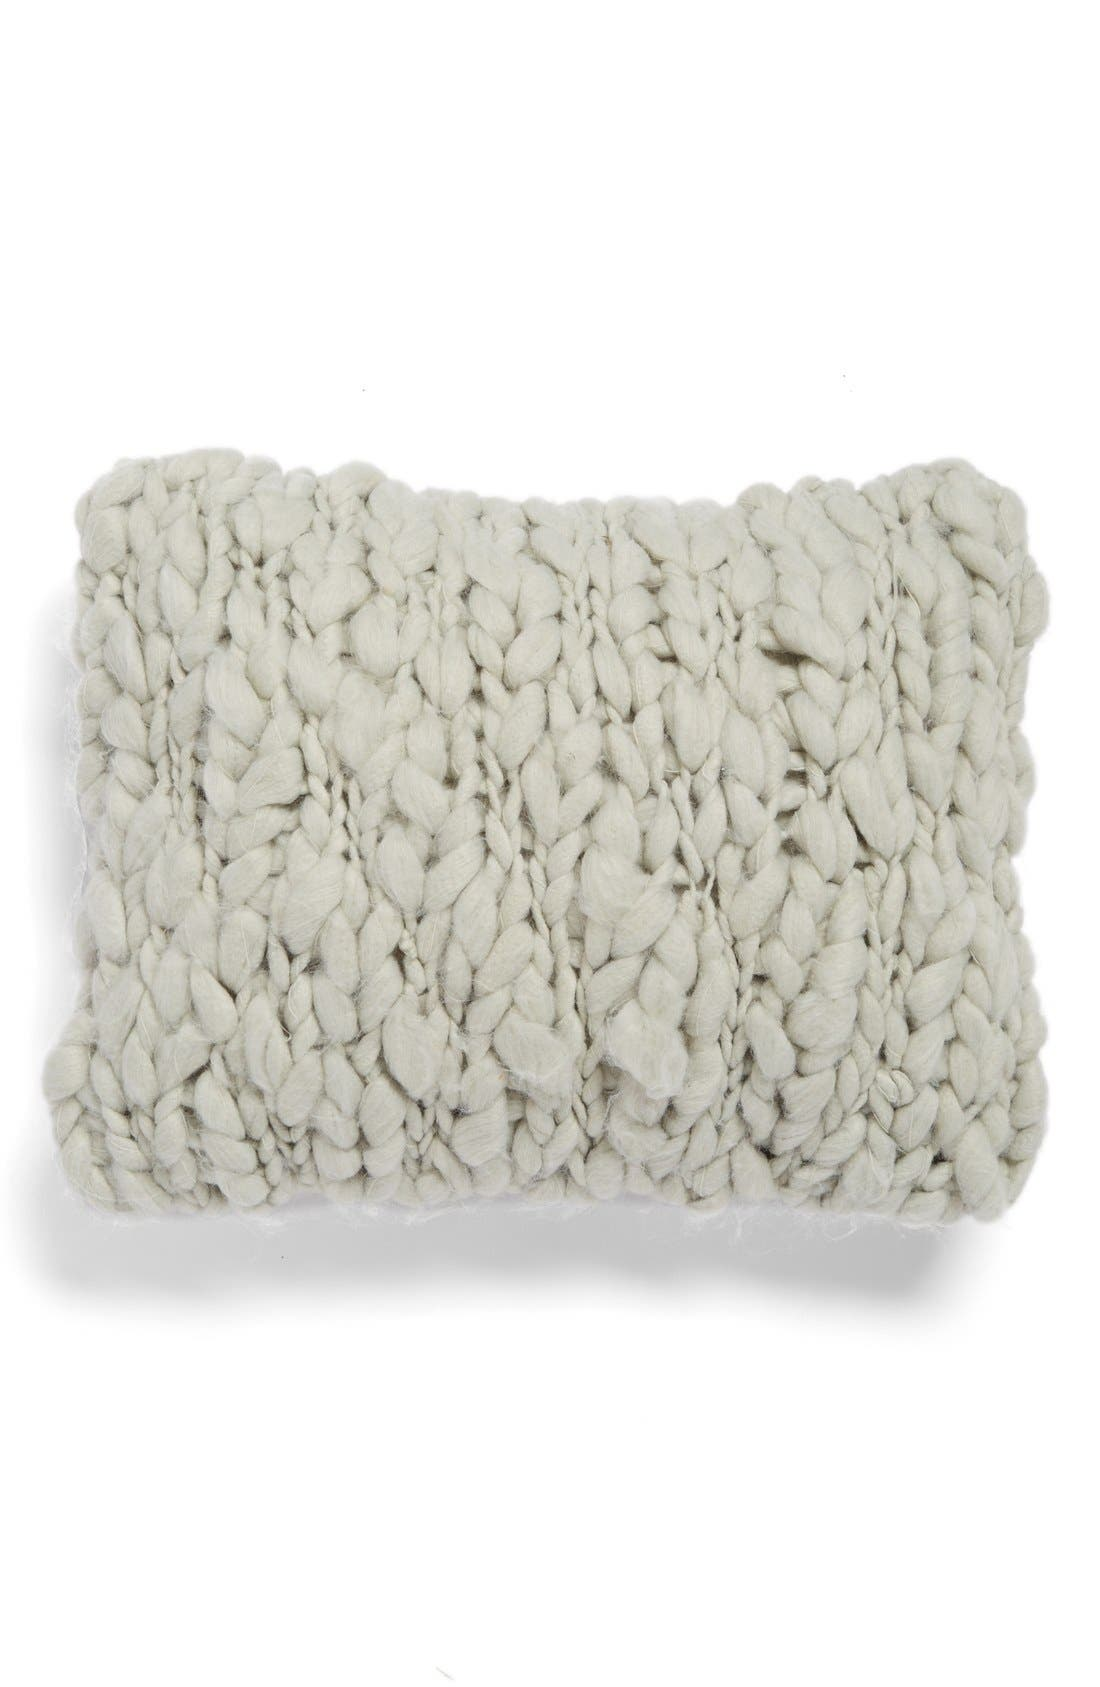 Main Image - Beekman 1802 'Minetto' Knit Pillow